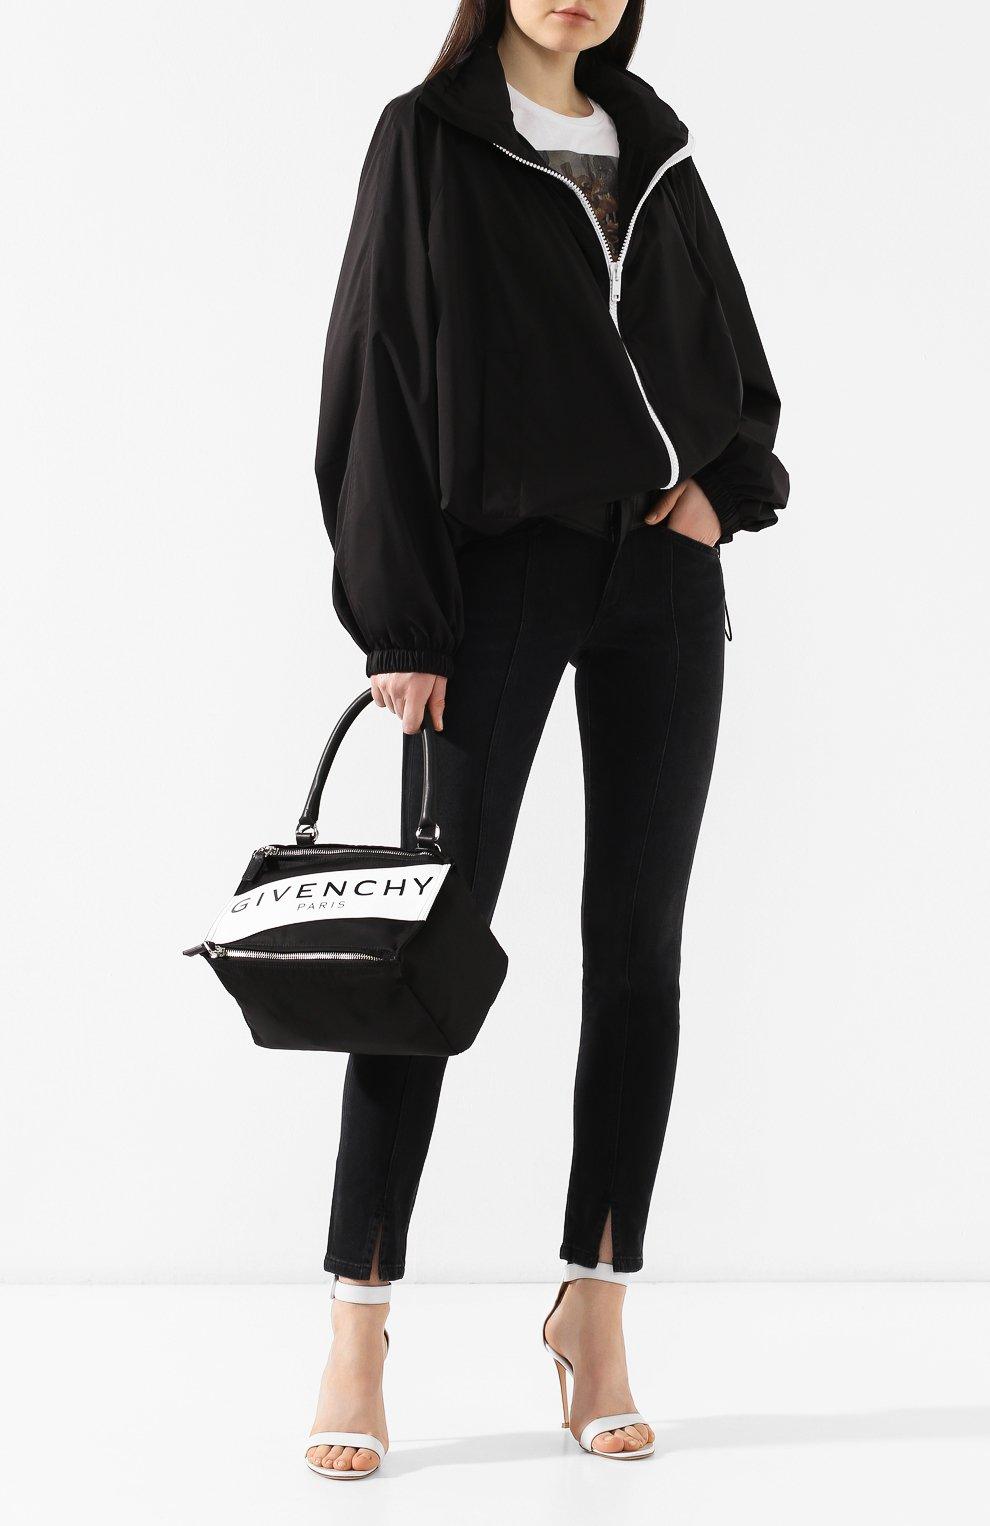 Сумка Pandora small Givenchy черная цвета | Фото №2